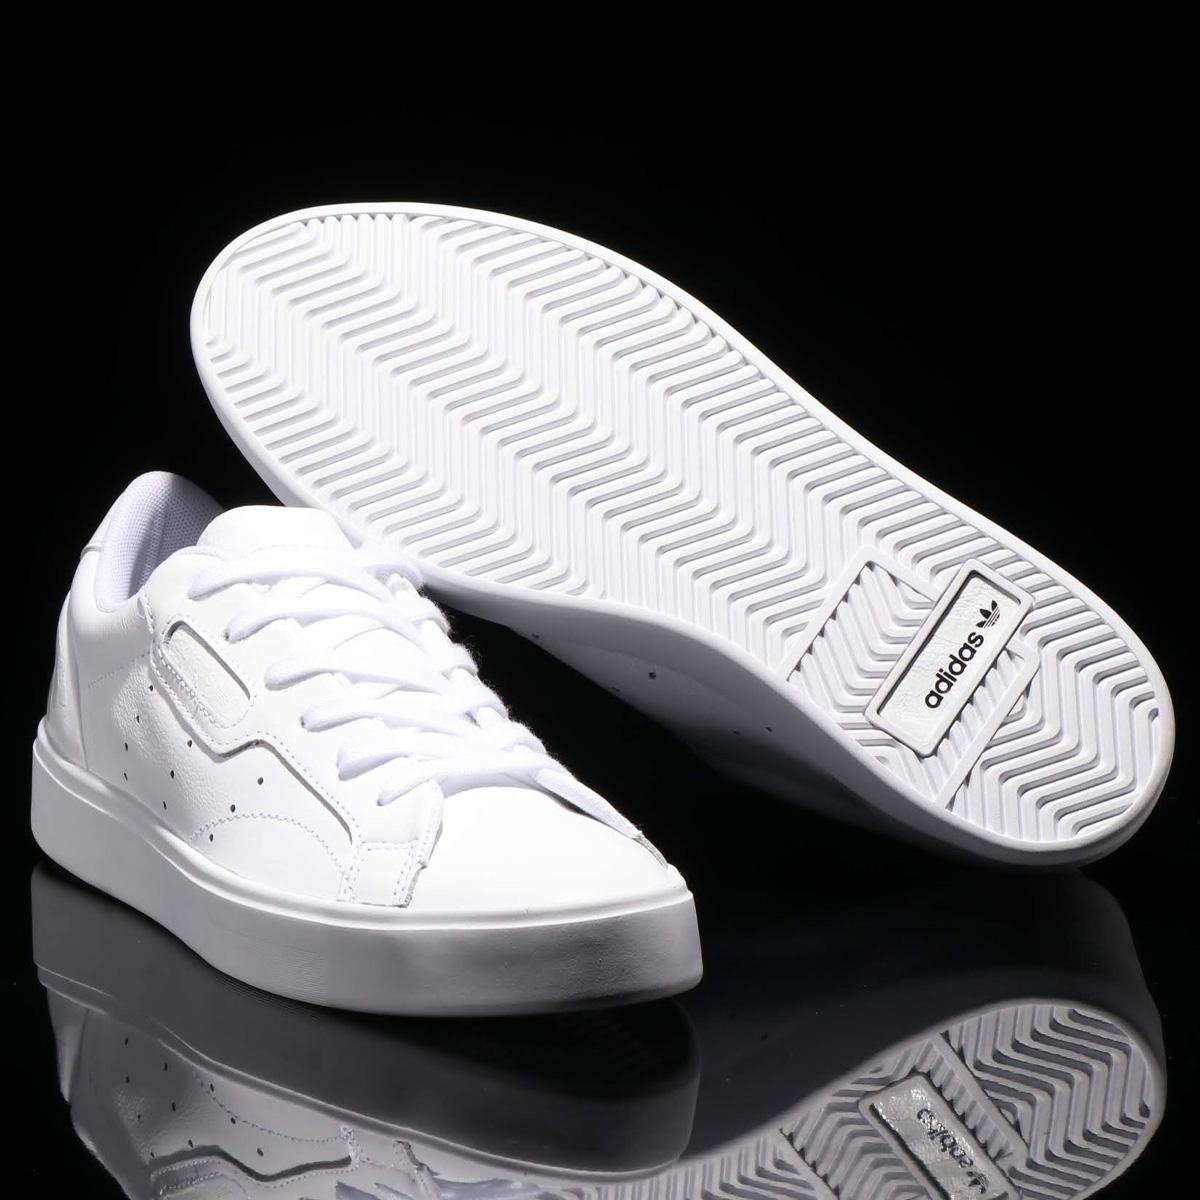 adidas Originals SLEEK W(アディダスオリジナルス スリーク W)RUNNING WHITE/CRYSTAL WHITE/CORE BLACK【メンズ レディース スニーカー】19SS-I